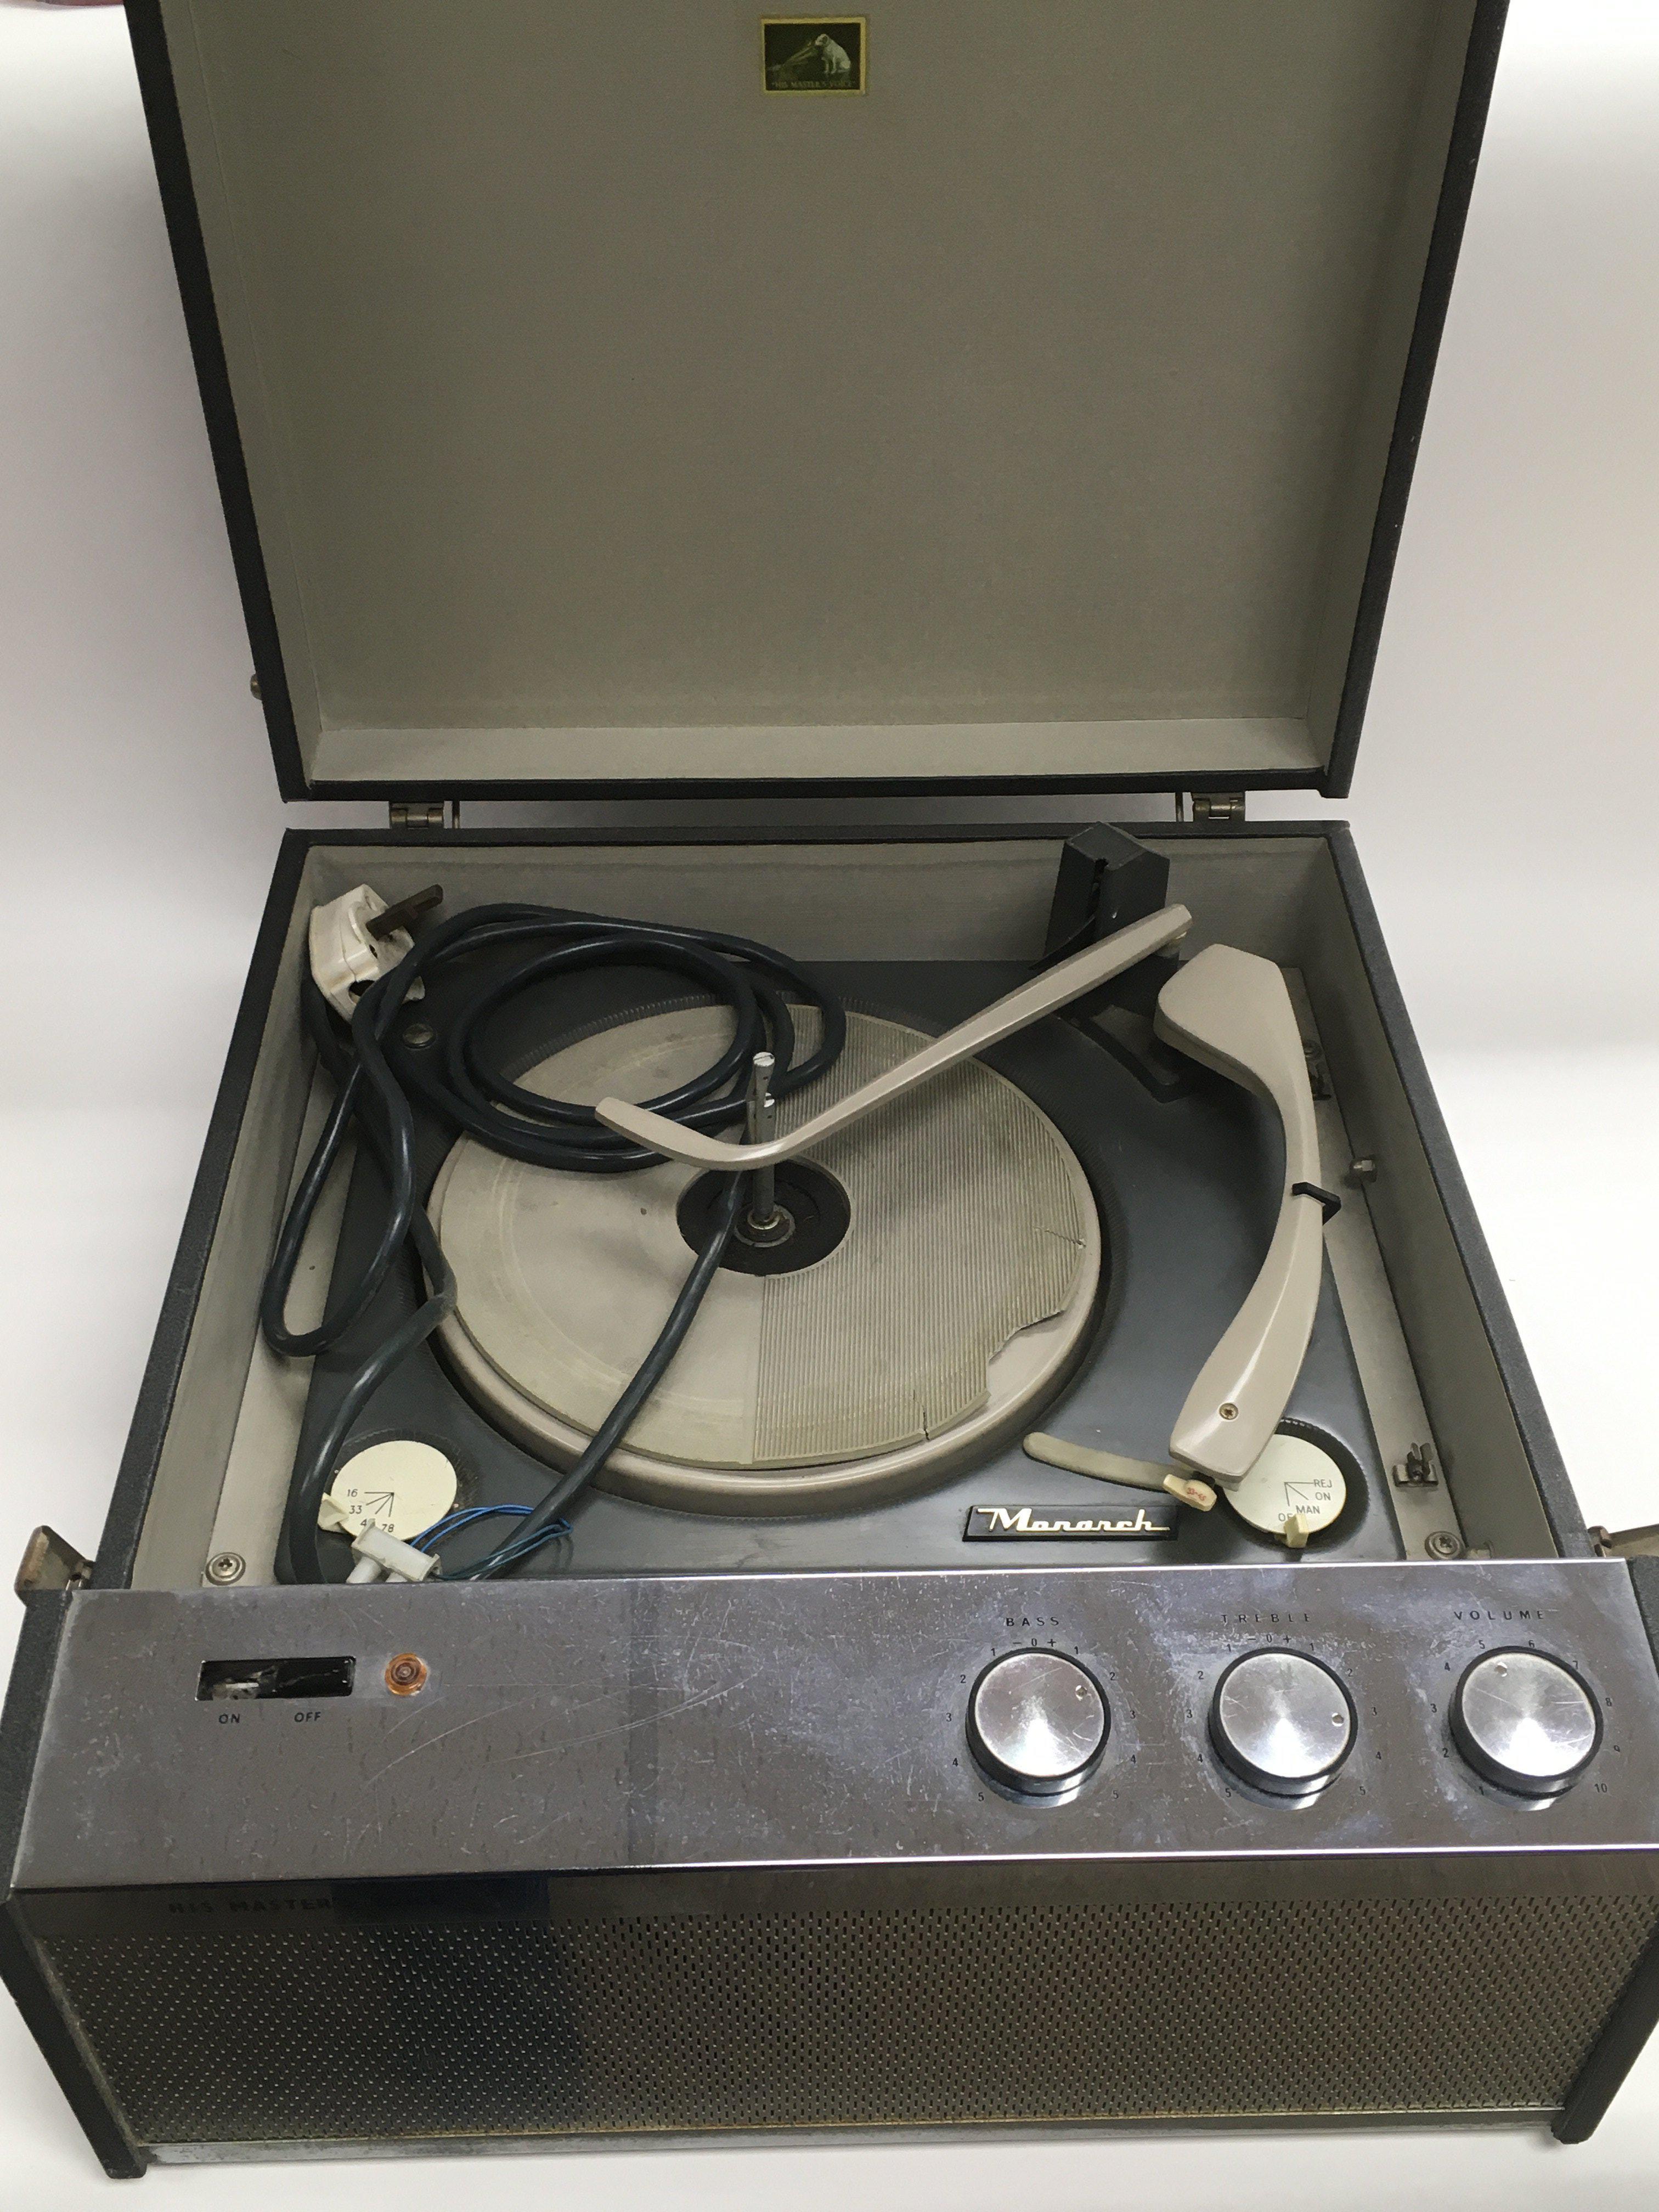 A vintage HMV portable record player.